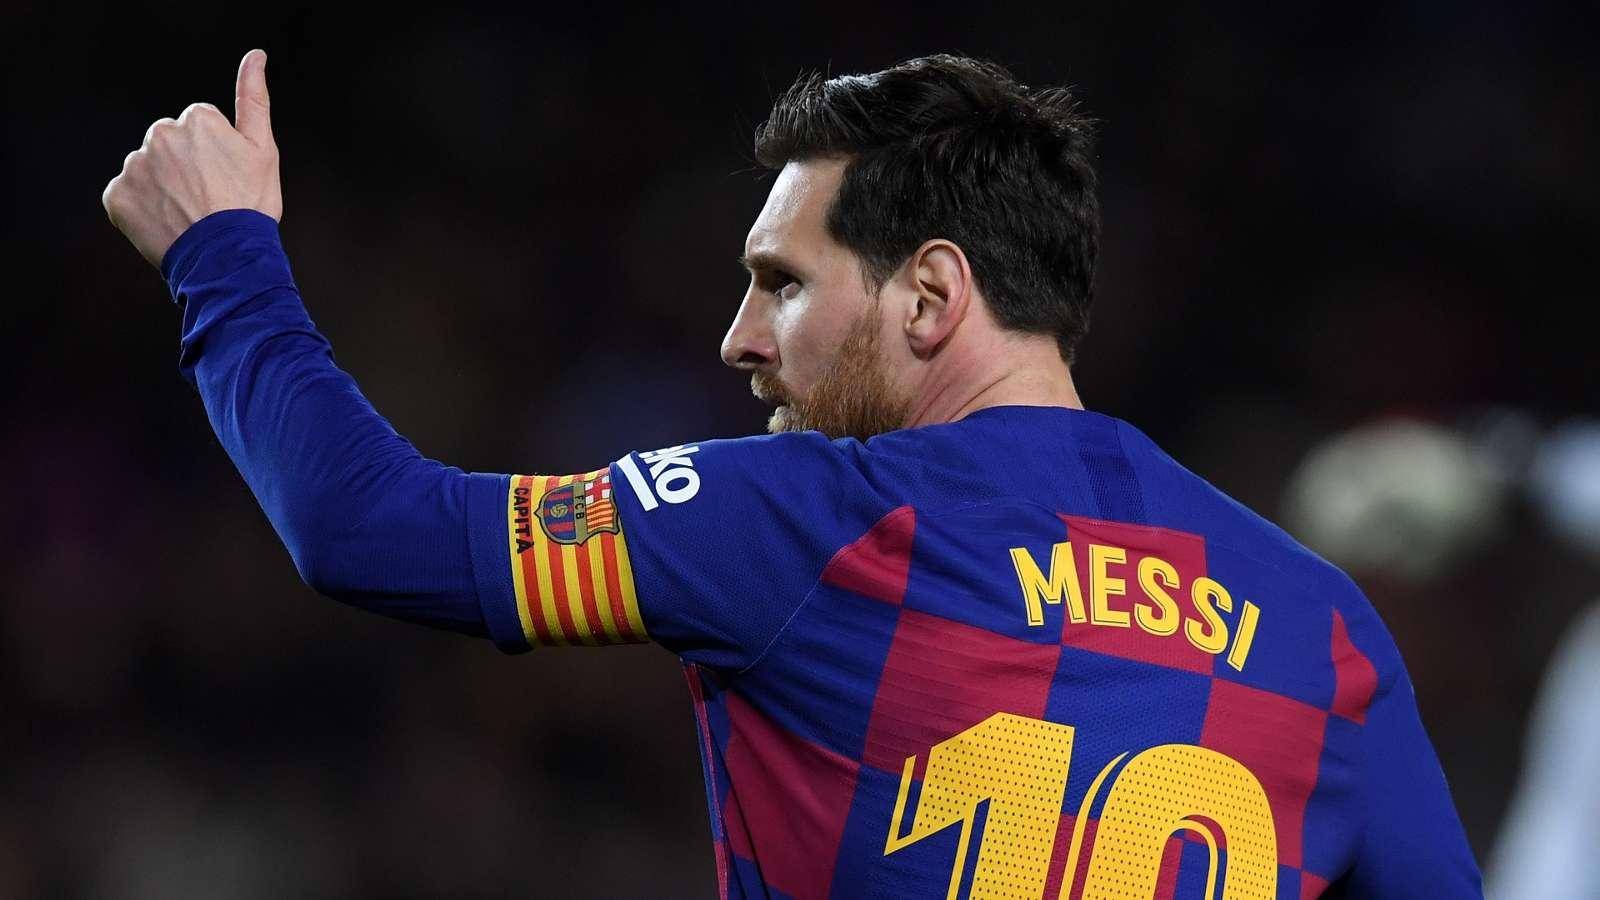 'Messi is no forbidden dream' - ex-Inter chief Moratti says club 'will explore deal' for Barcelona star - Bóng Đá